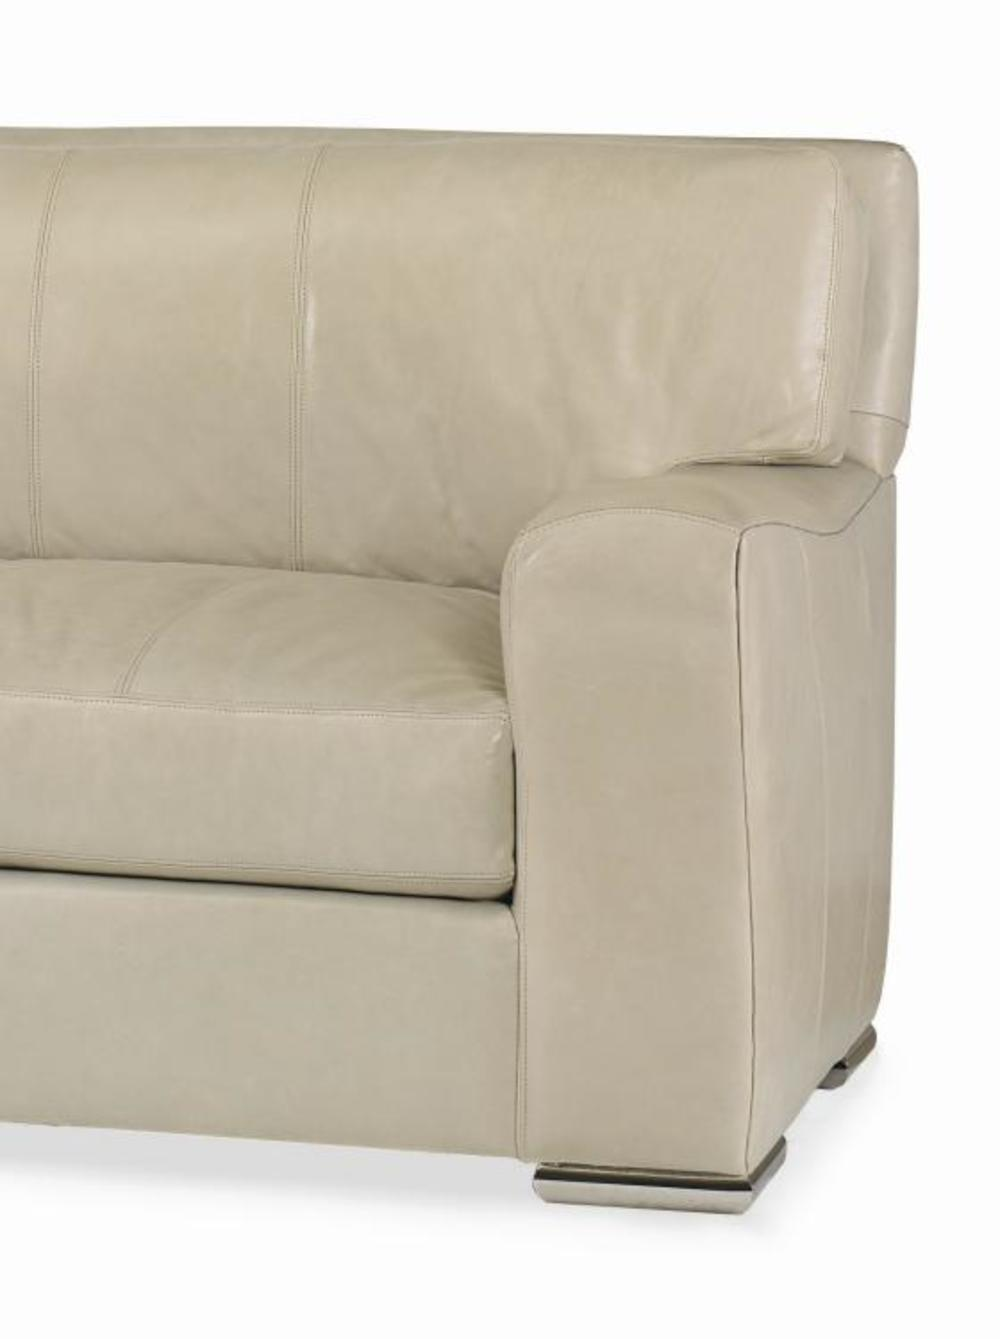 Century Furniture - Large Sofa